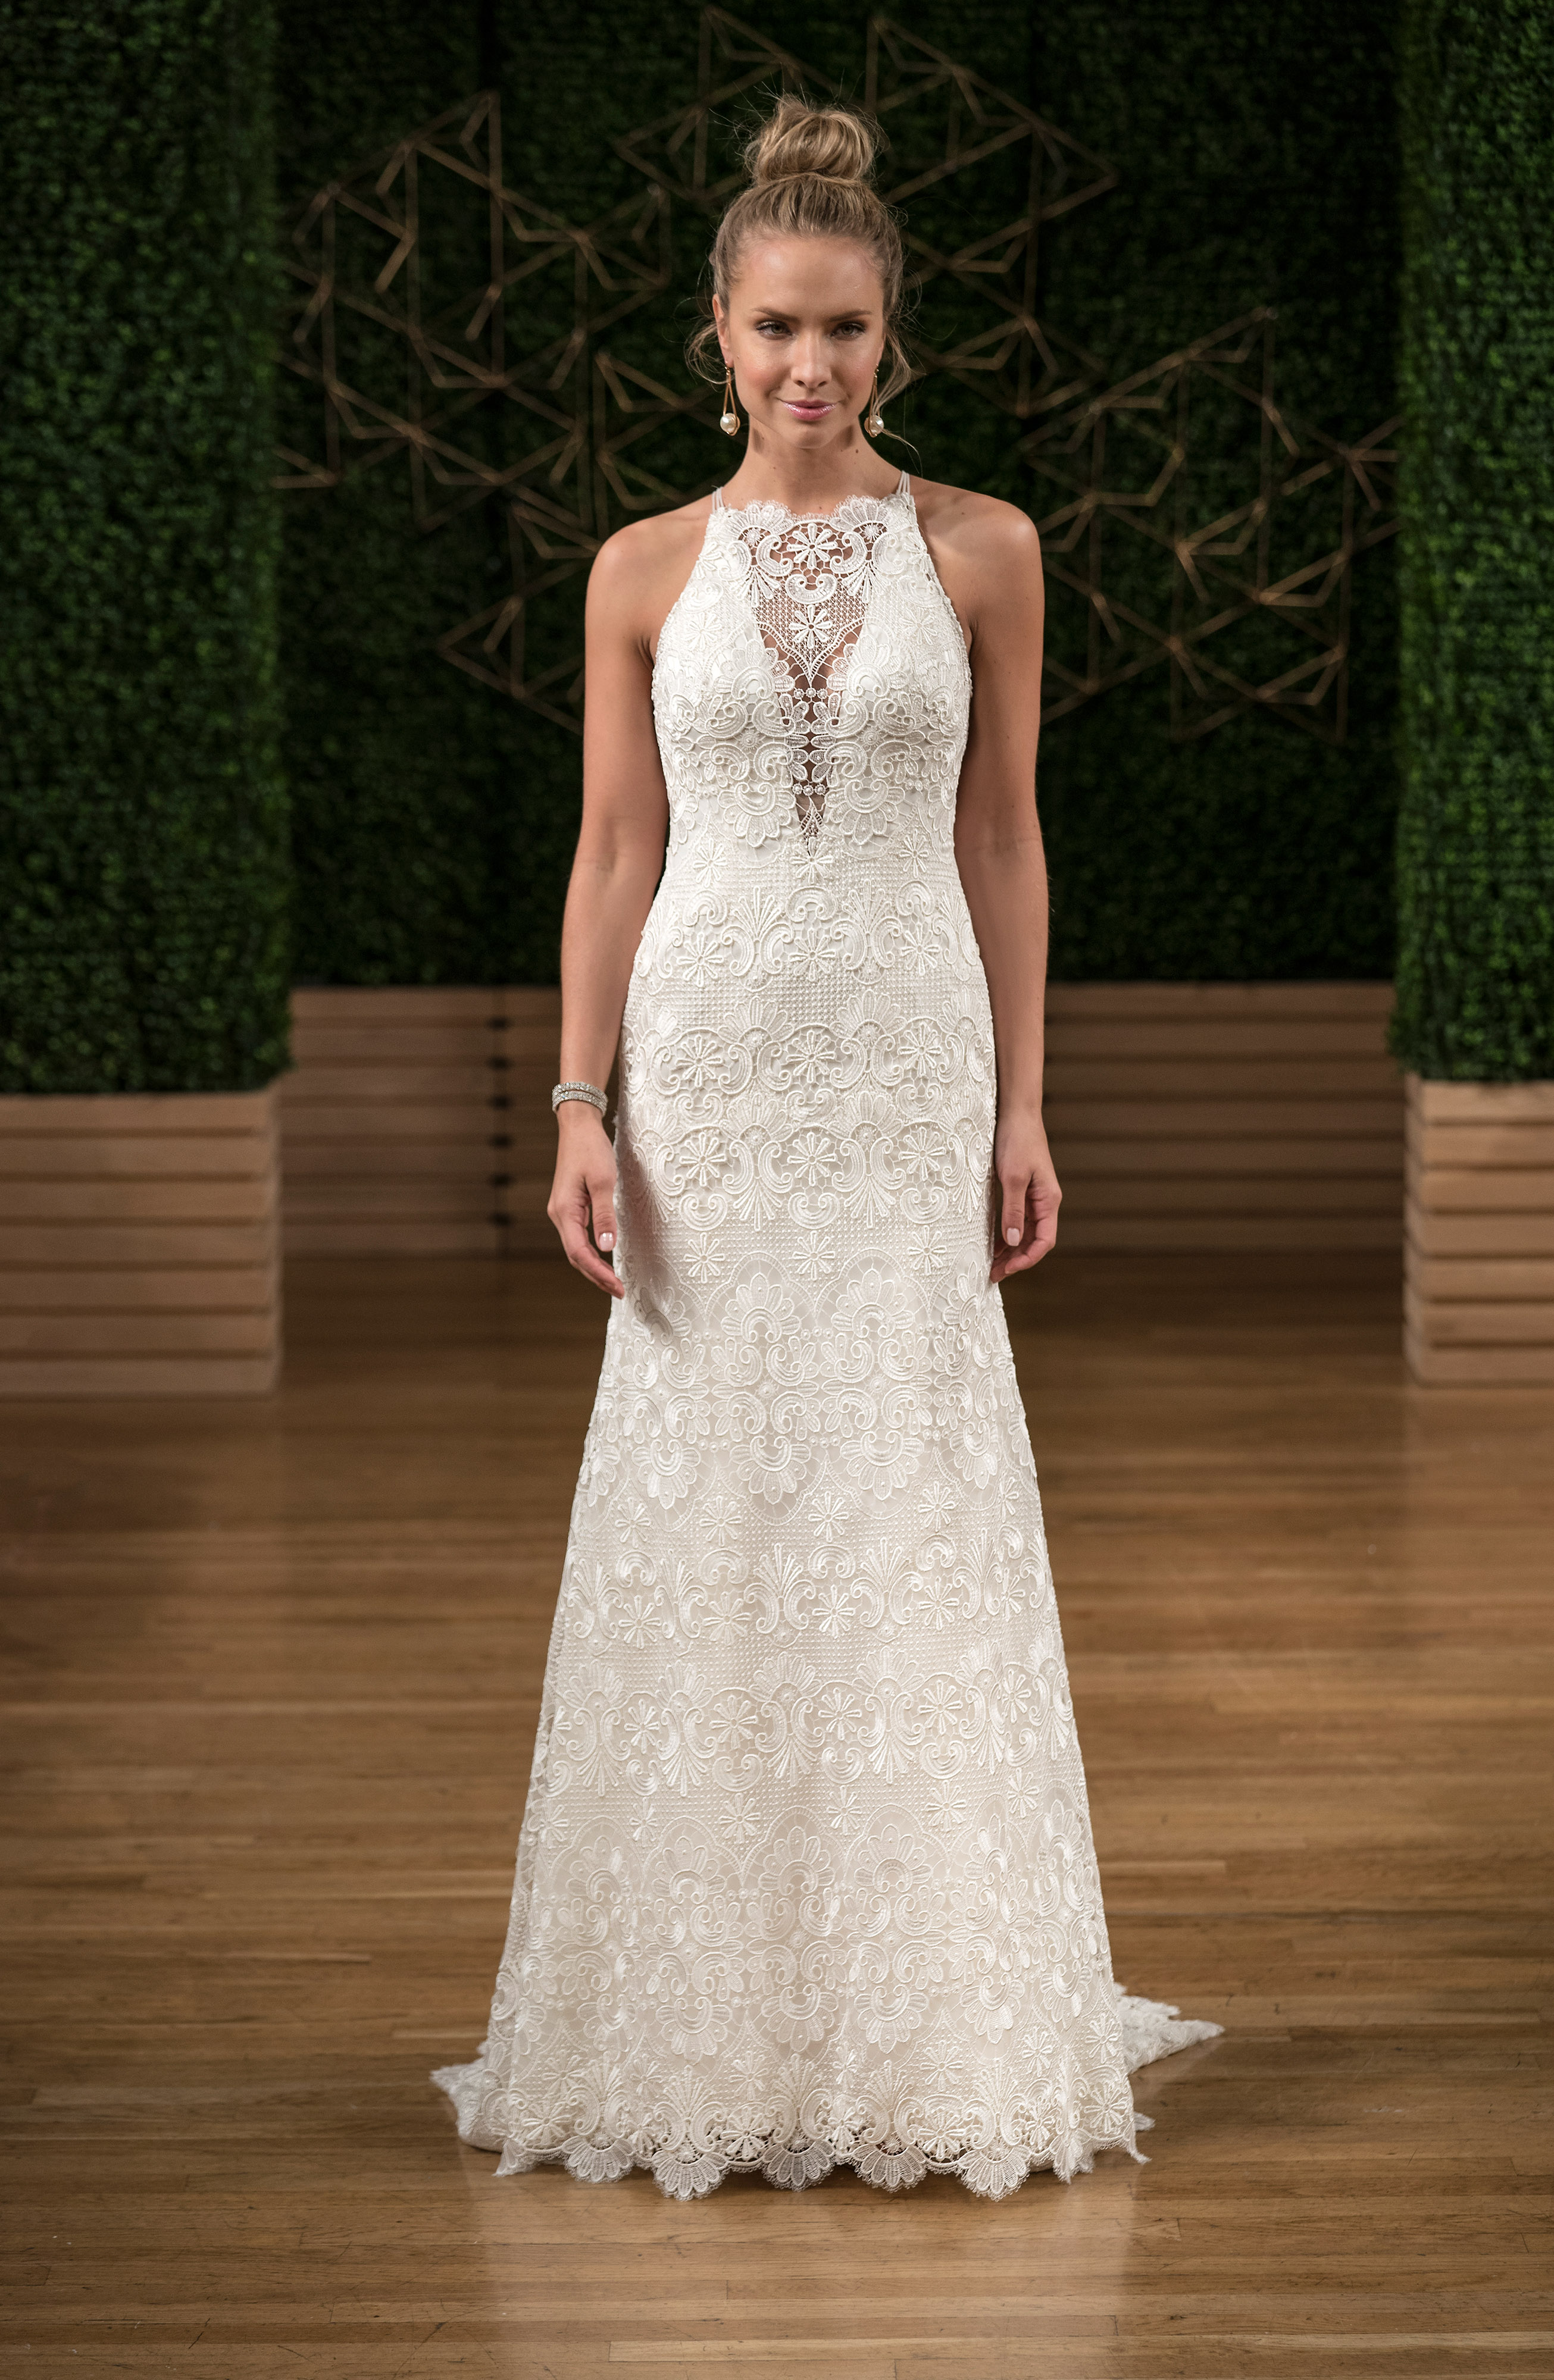 sottero midgley wedding dress fall 2018 high neck illusion v sheath